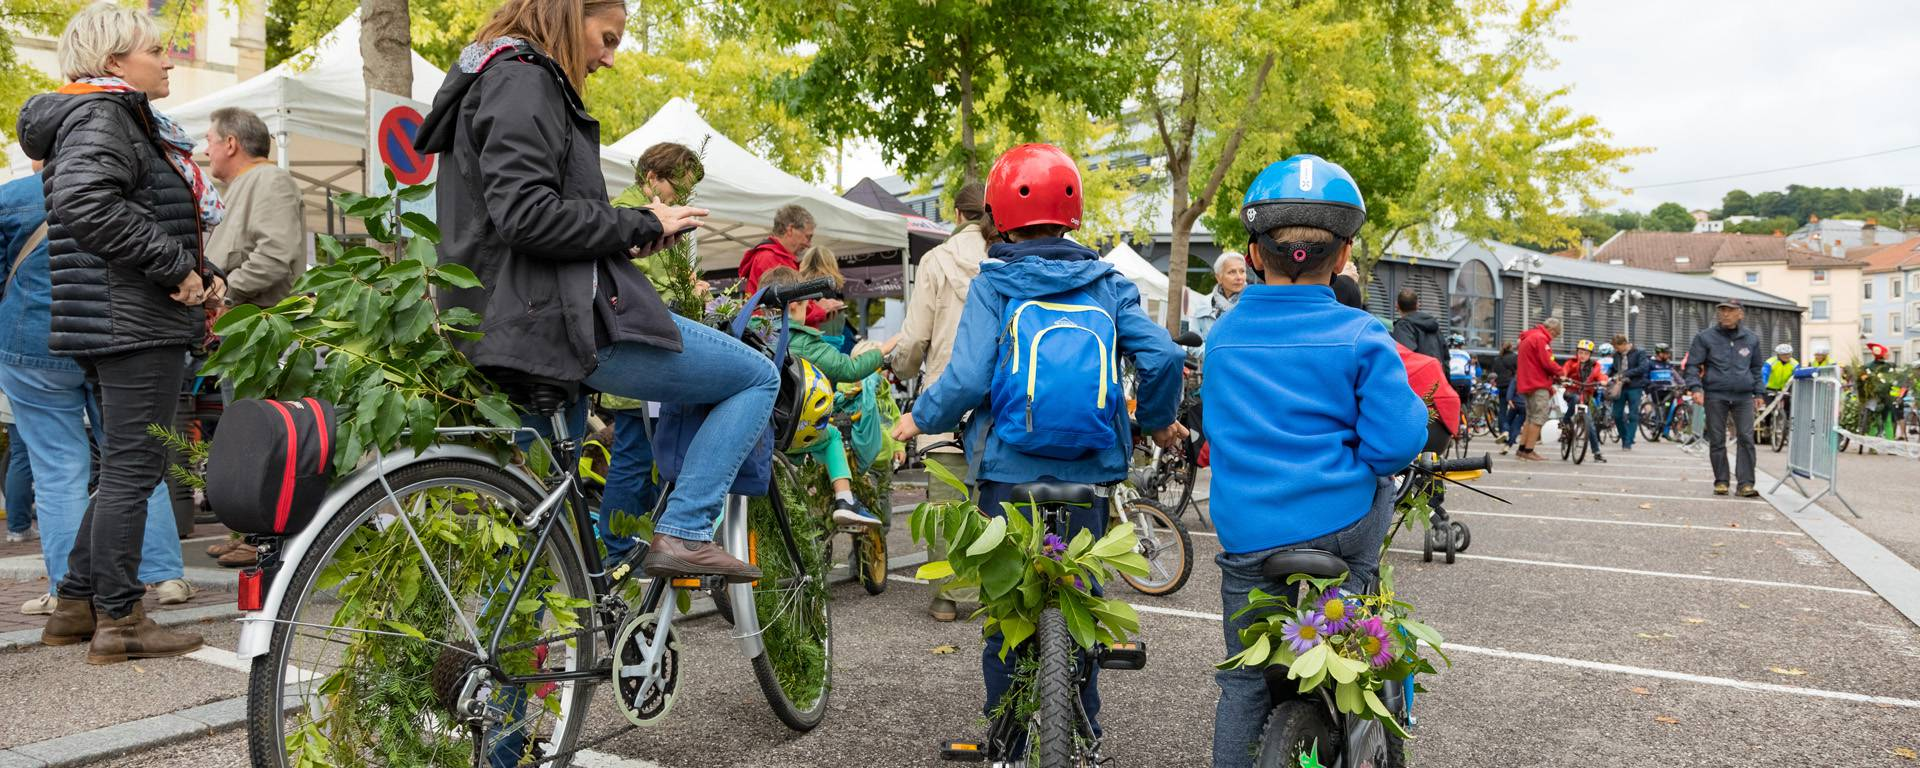 Les Folles Journées du Vélo - Cycling activities in Epinal - Cycling competition in Epinal - Vélo Vosges